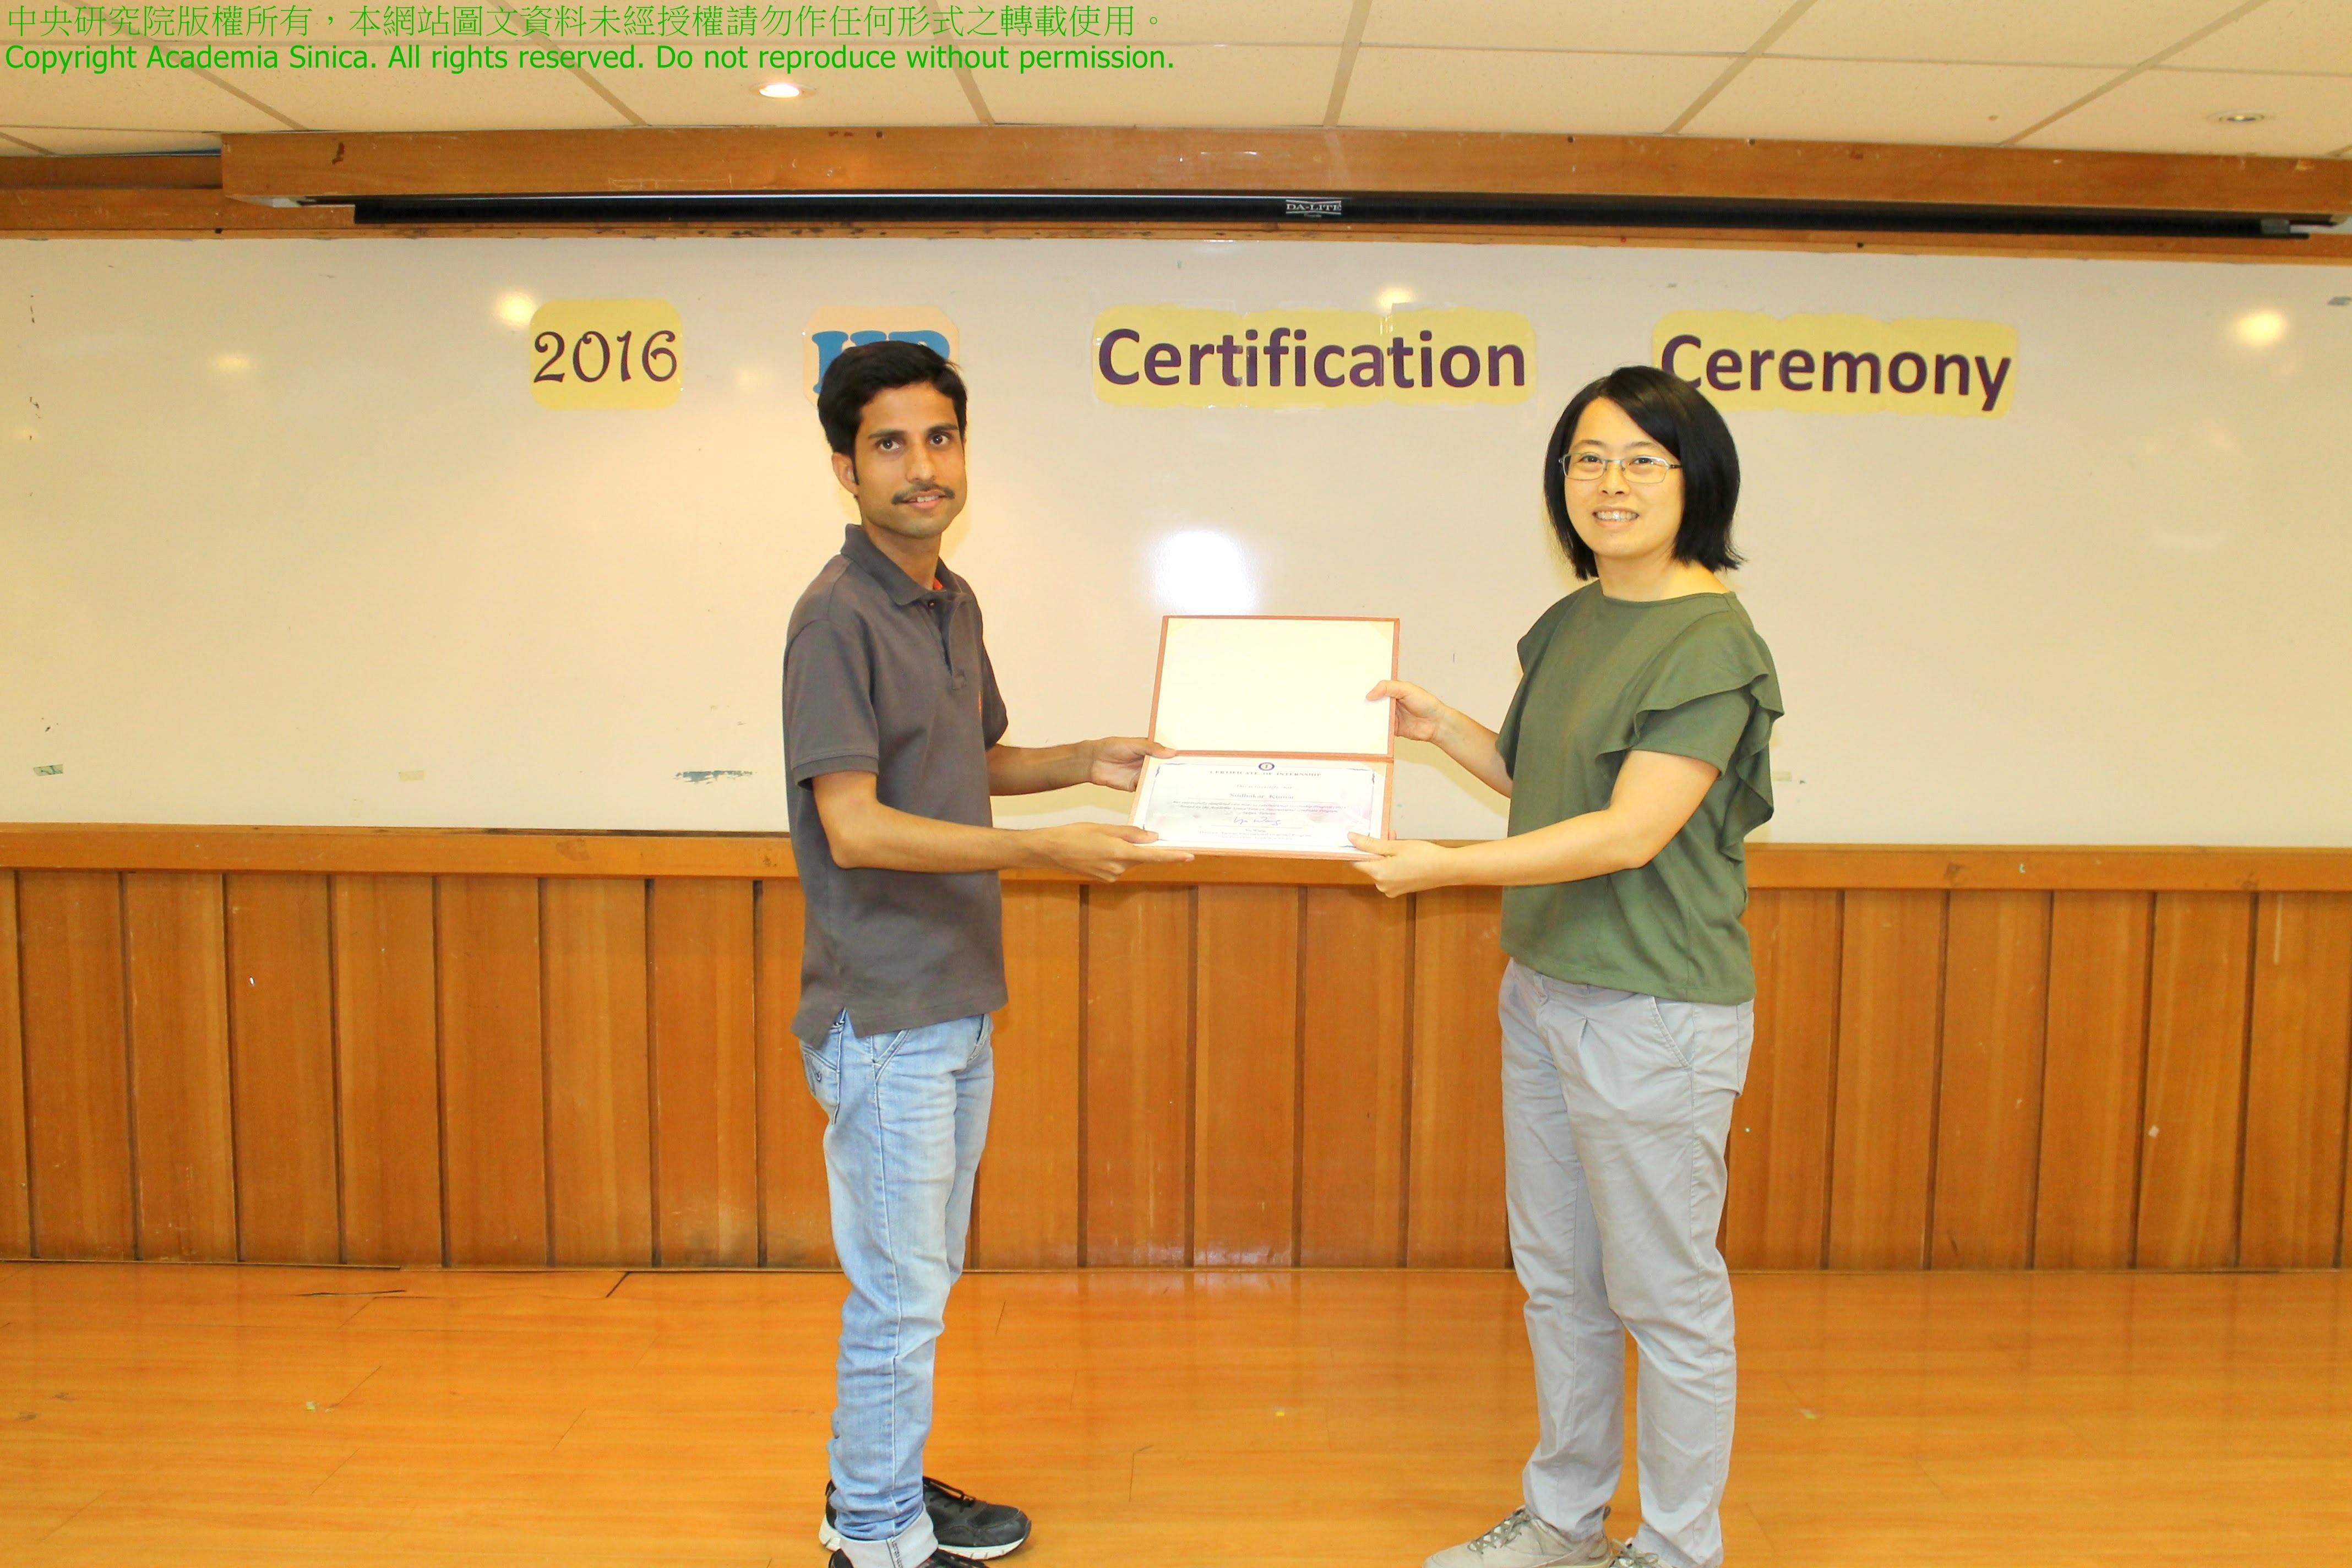 an-internship-experience-with-taiwan-international-graduate-program-tigp-iip-story-of-sudhakar-from-smvdu